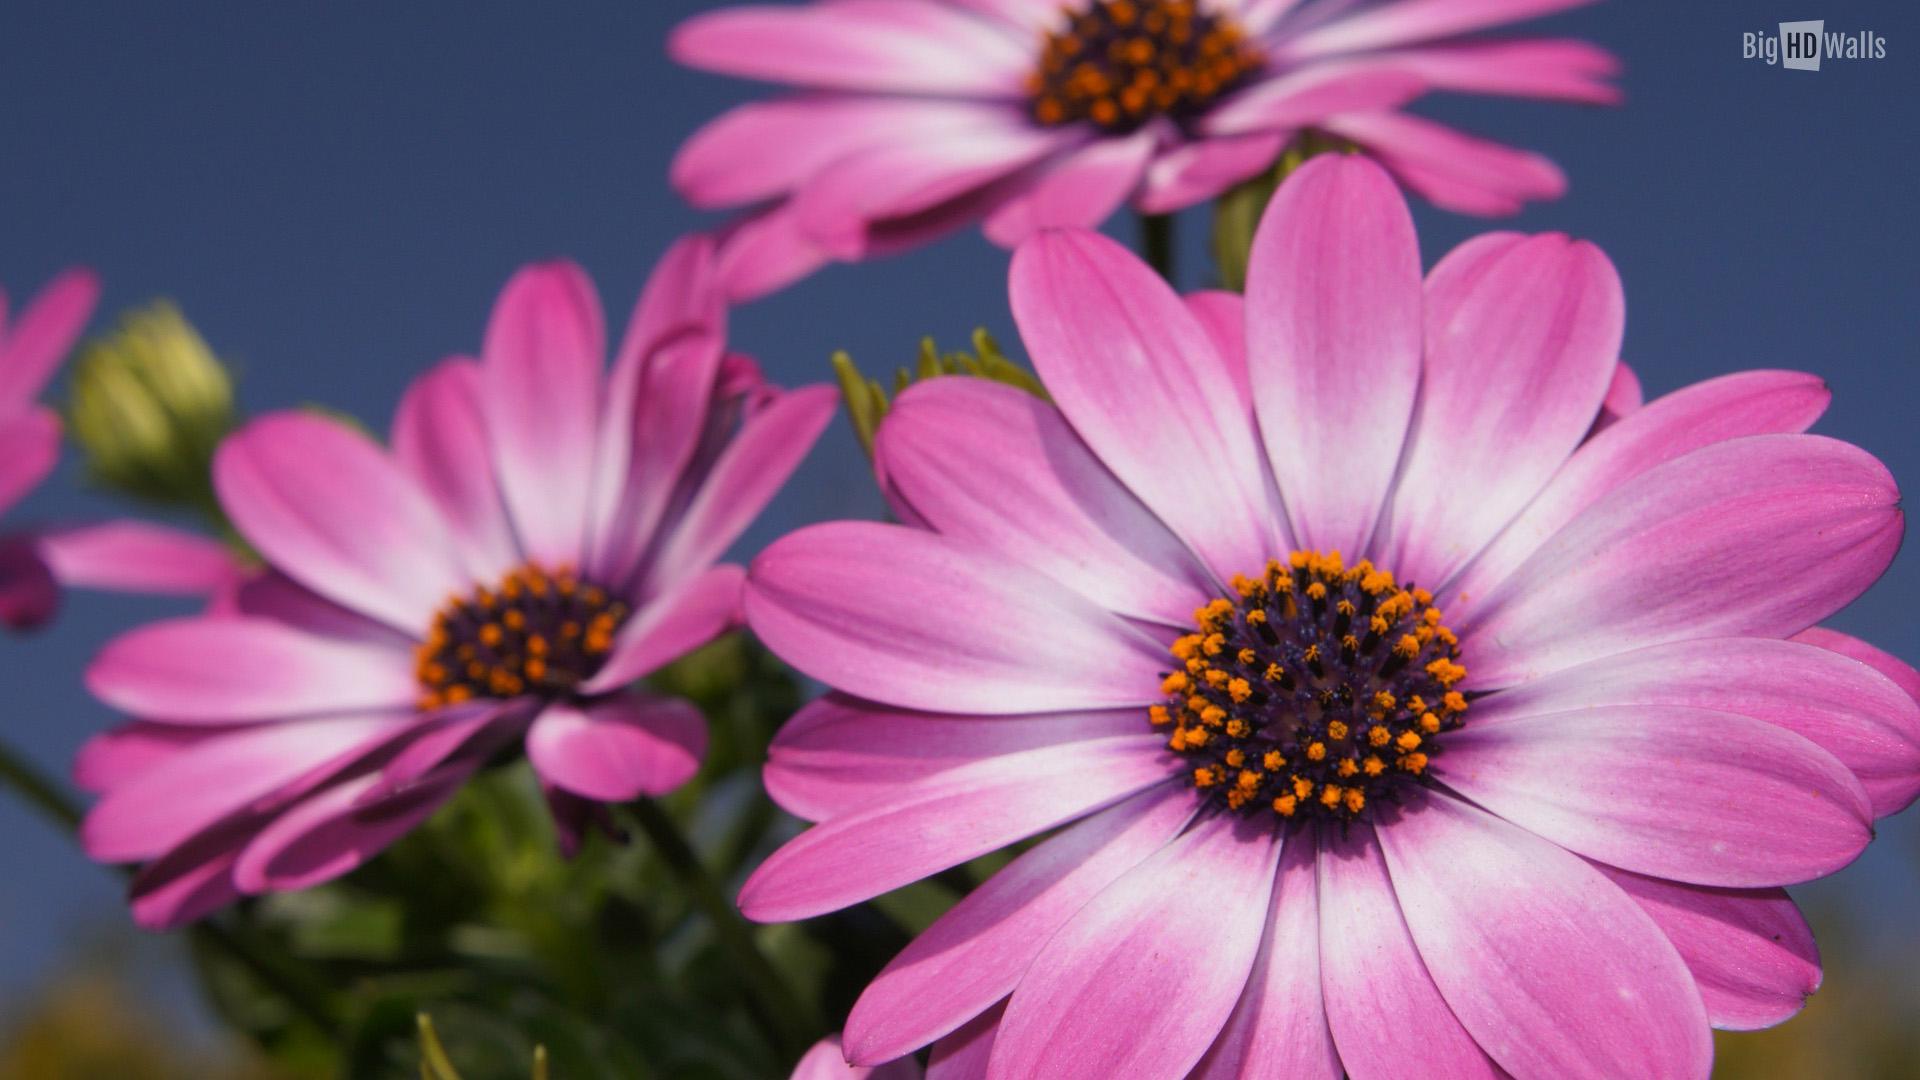 Spring Flowers Hd wallpaper   1266047 1920x1080